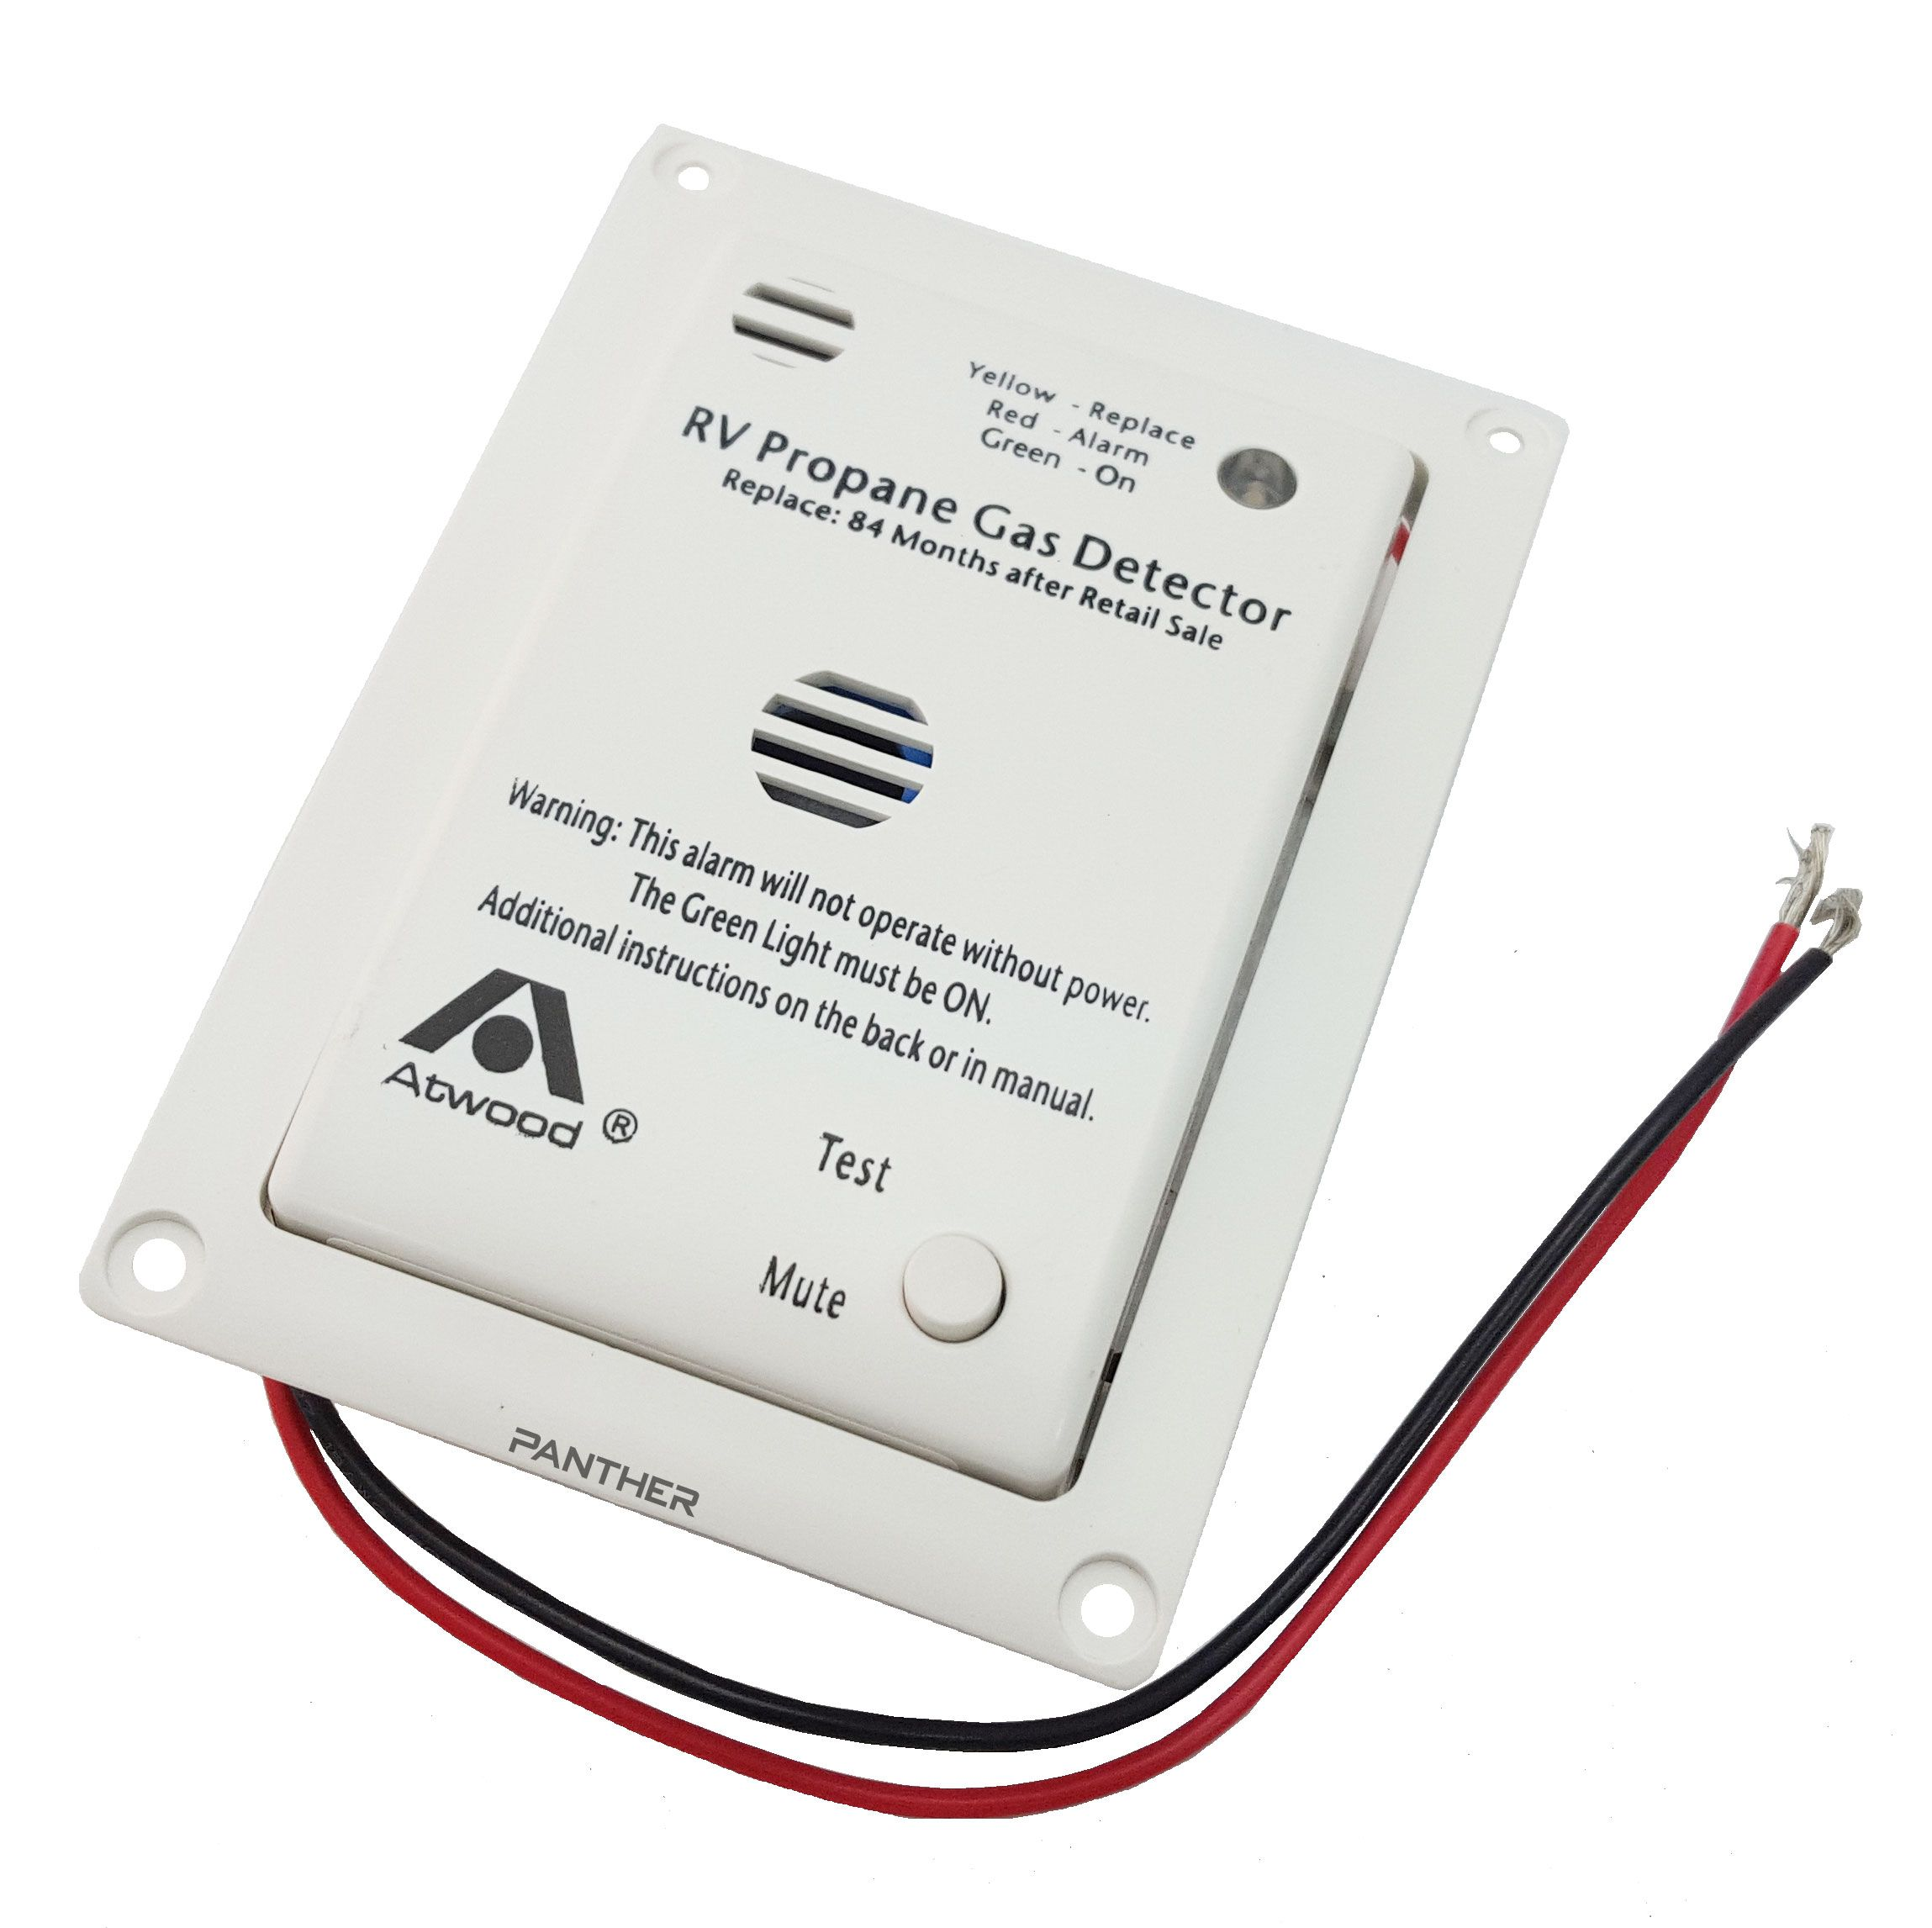 Dometic (Atwood) 36720 LP Gas / Propane Leak Detector